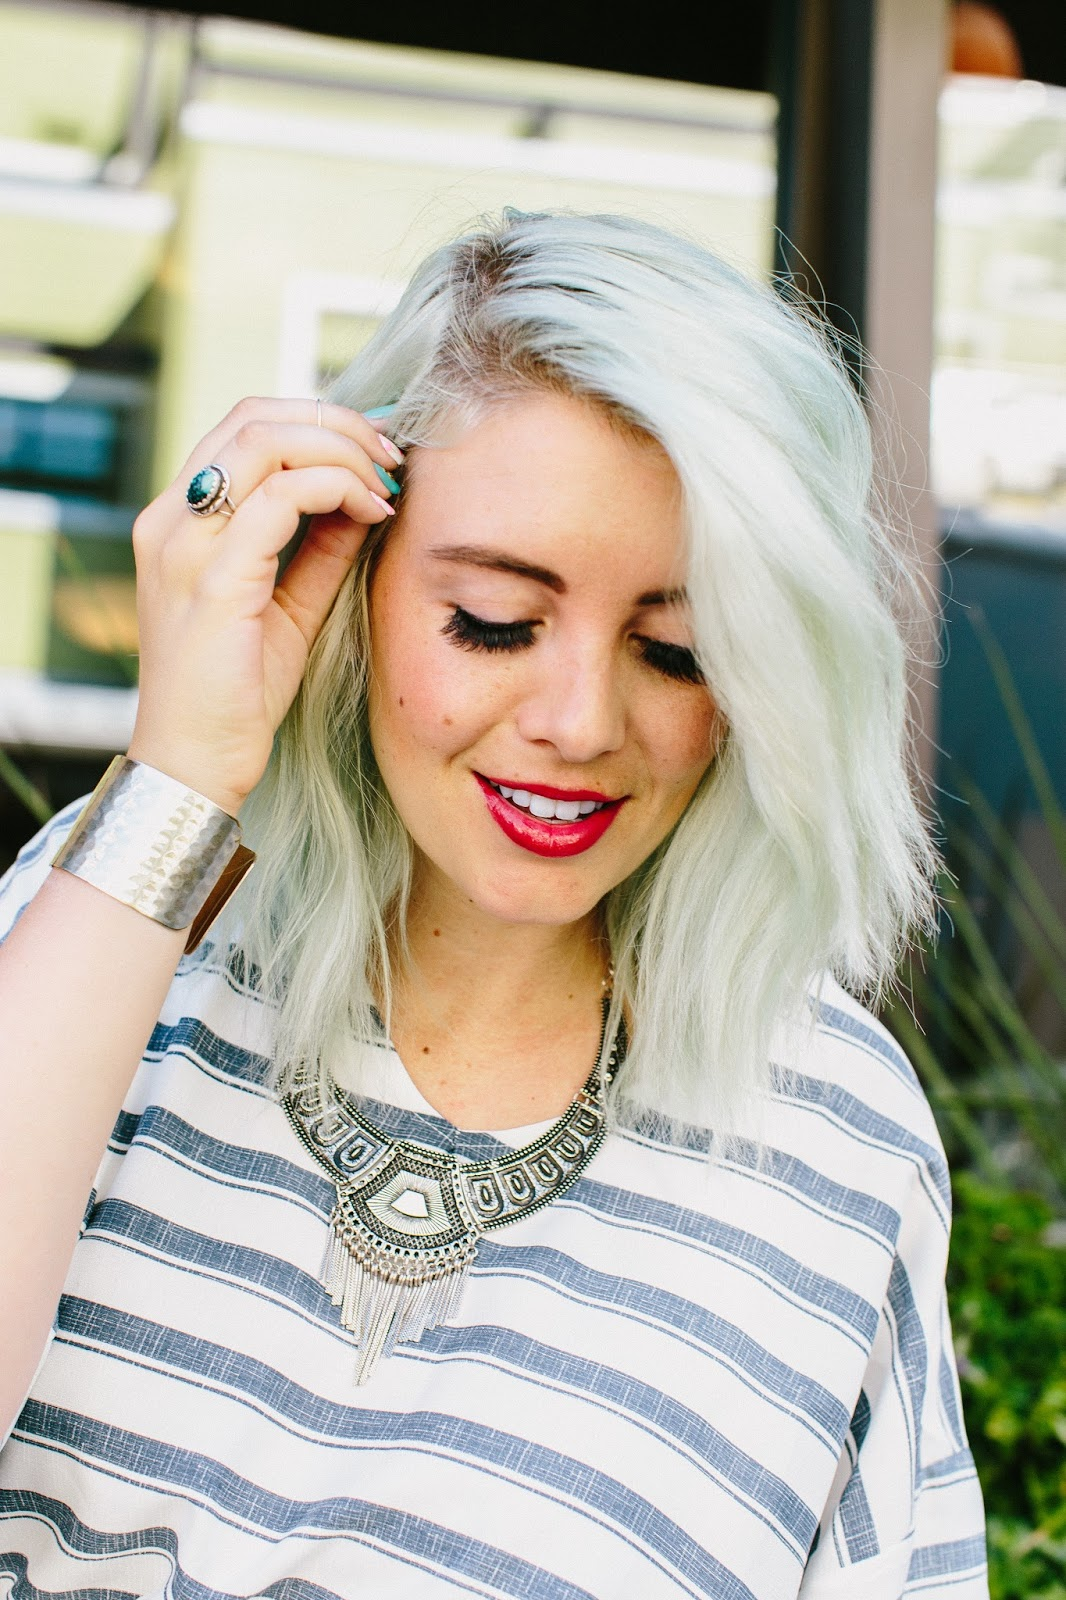 Rhubarb LipSense, Stripes, Blue Hair